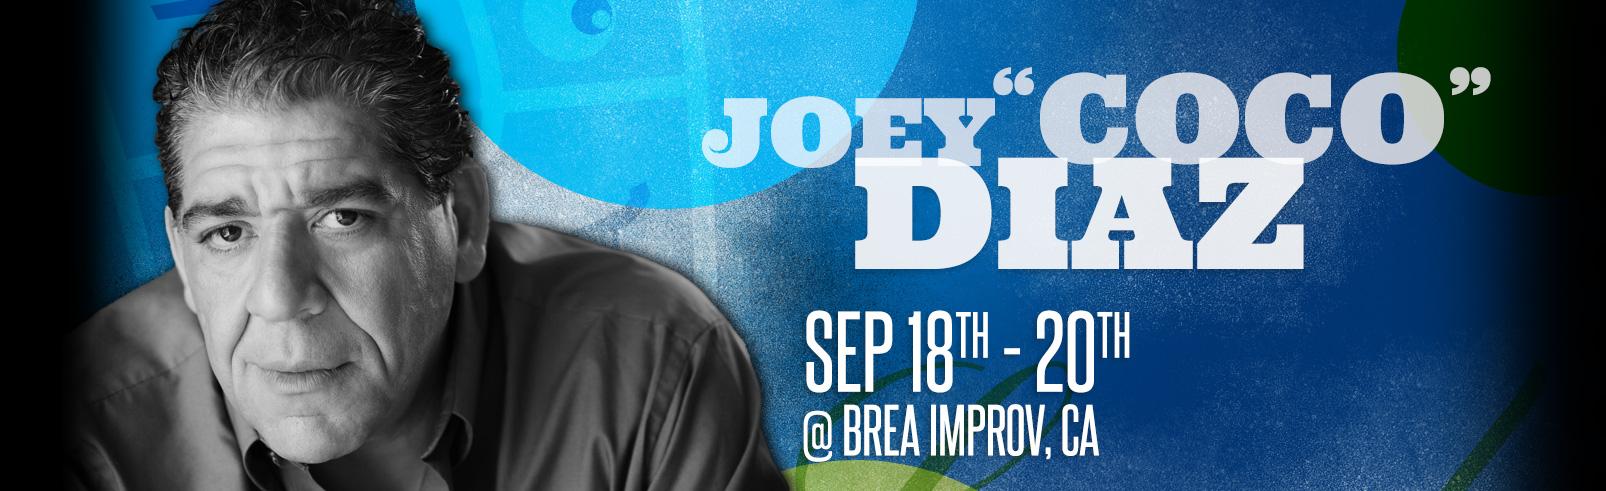 Joey Diaz @ Brea Improv